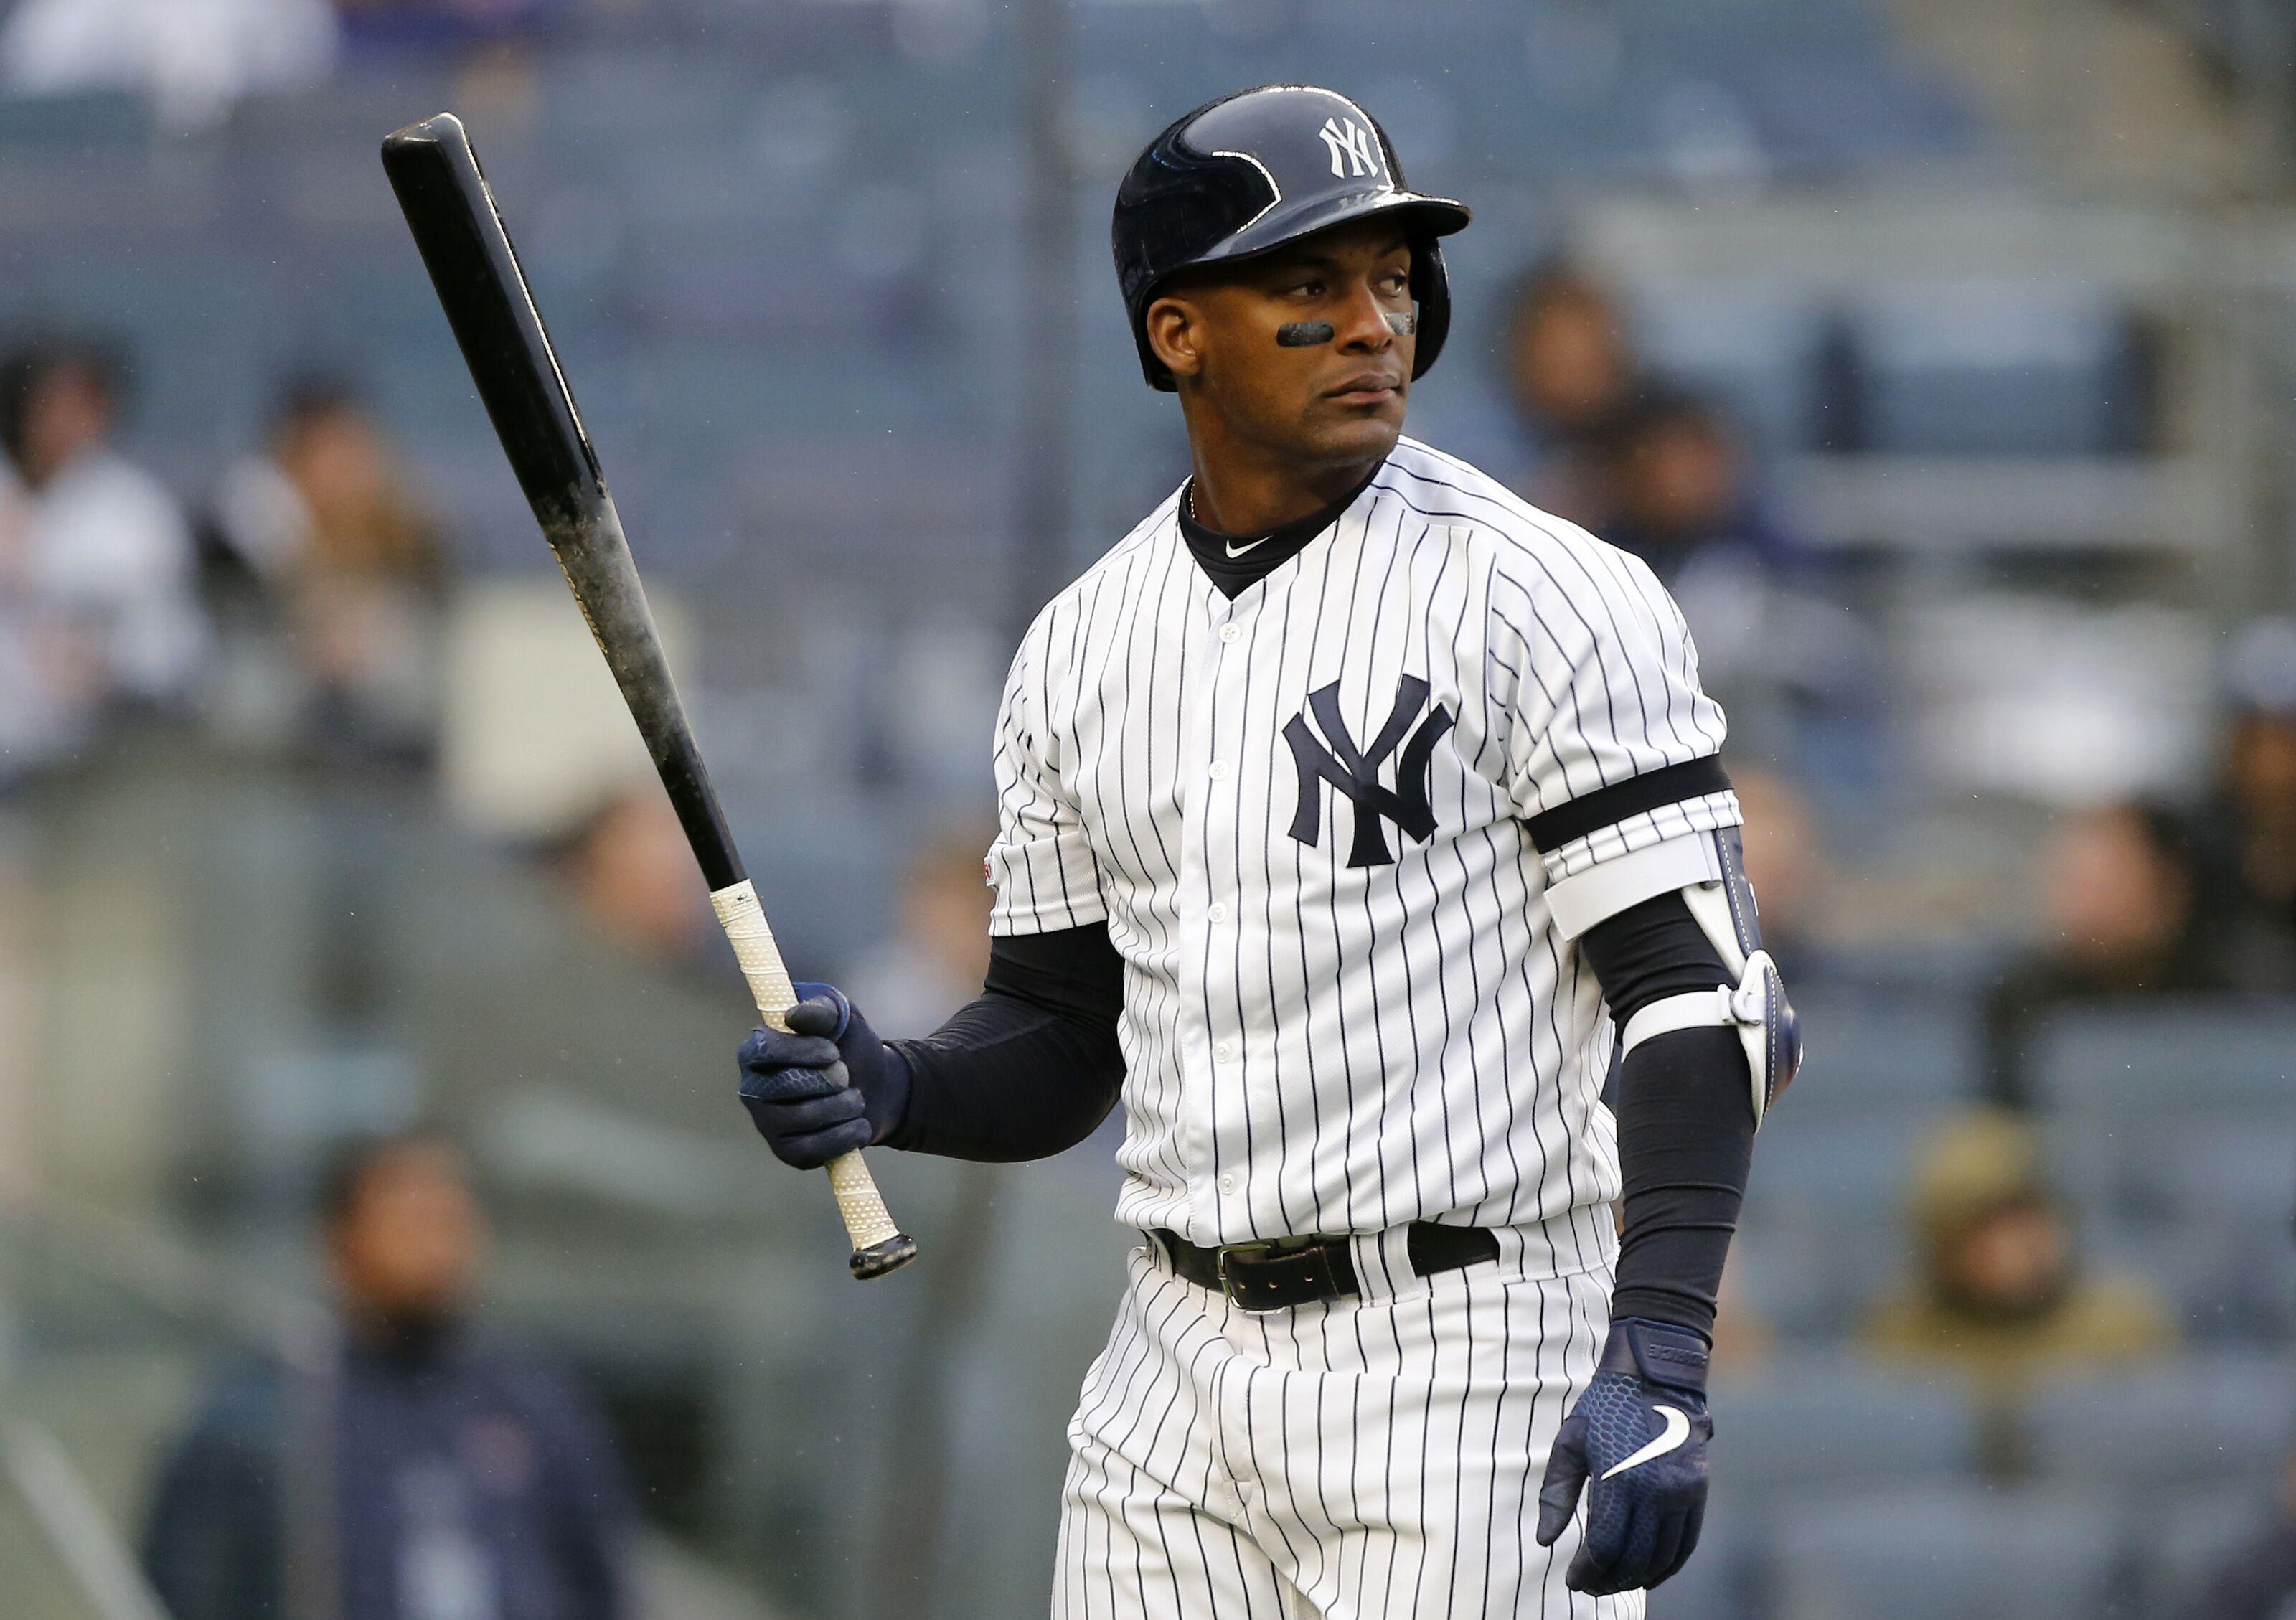 Should the Yankees trade Miguel Andujar?